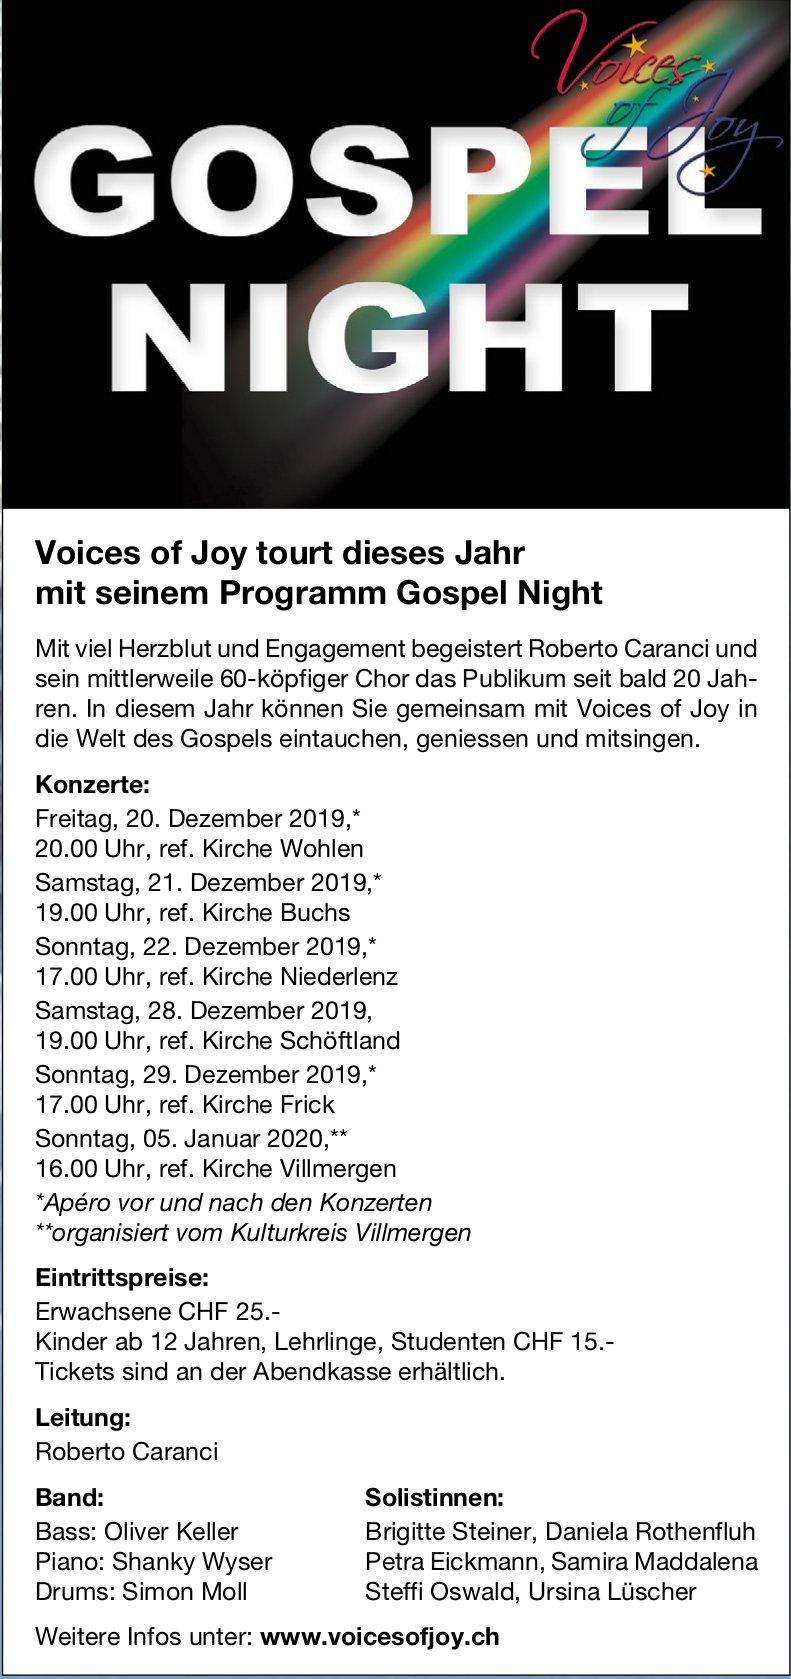 Voices of Joy: Gospel Night - Konzerte Datum